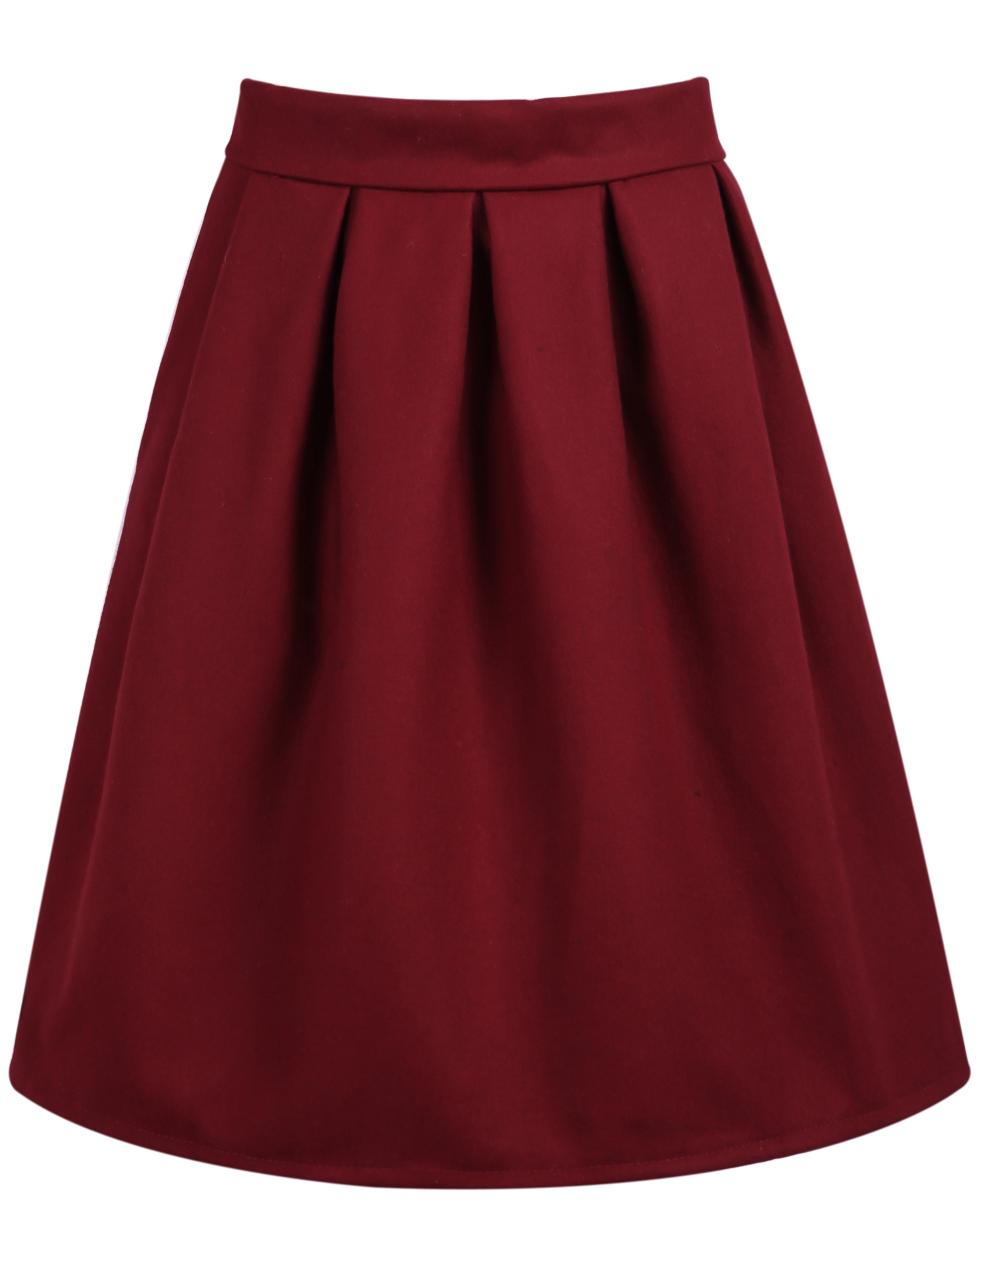 adec8a2646 Red High Waist Pleated Skirt -SheIn(Sheinside)